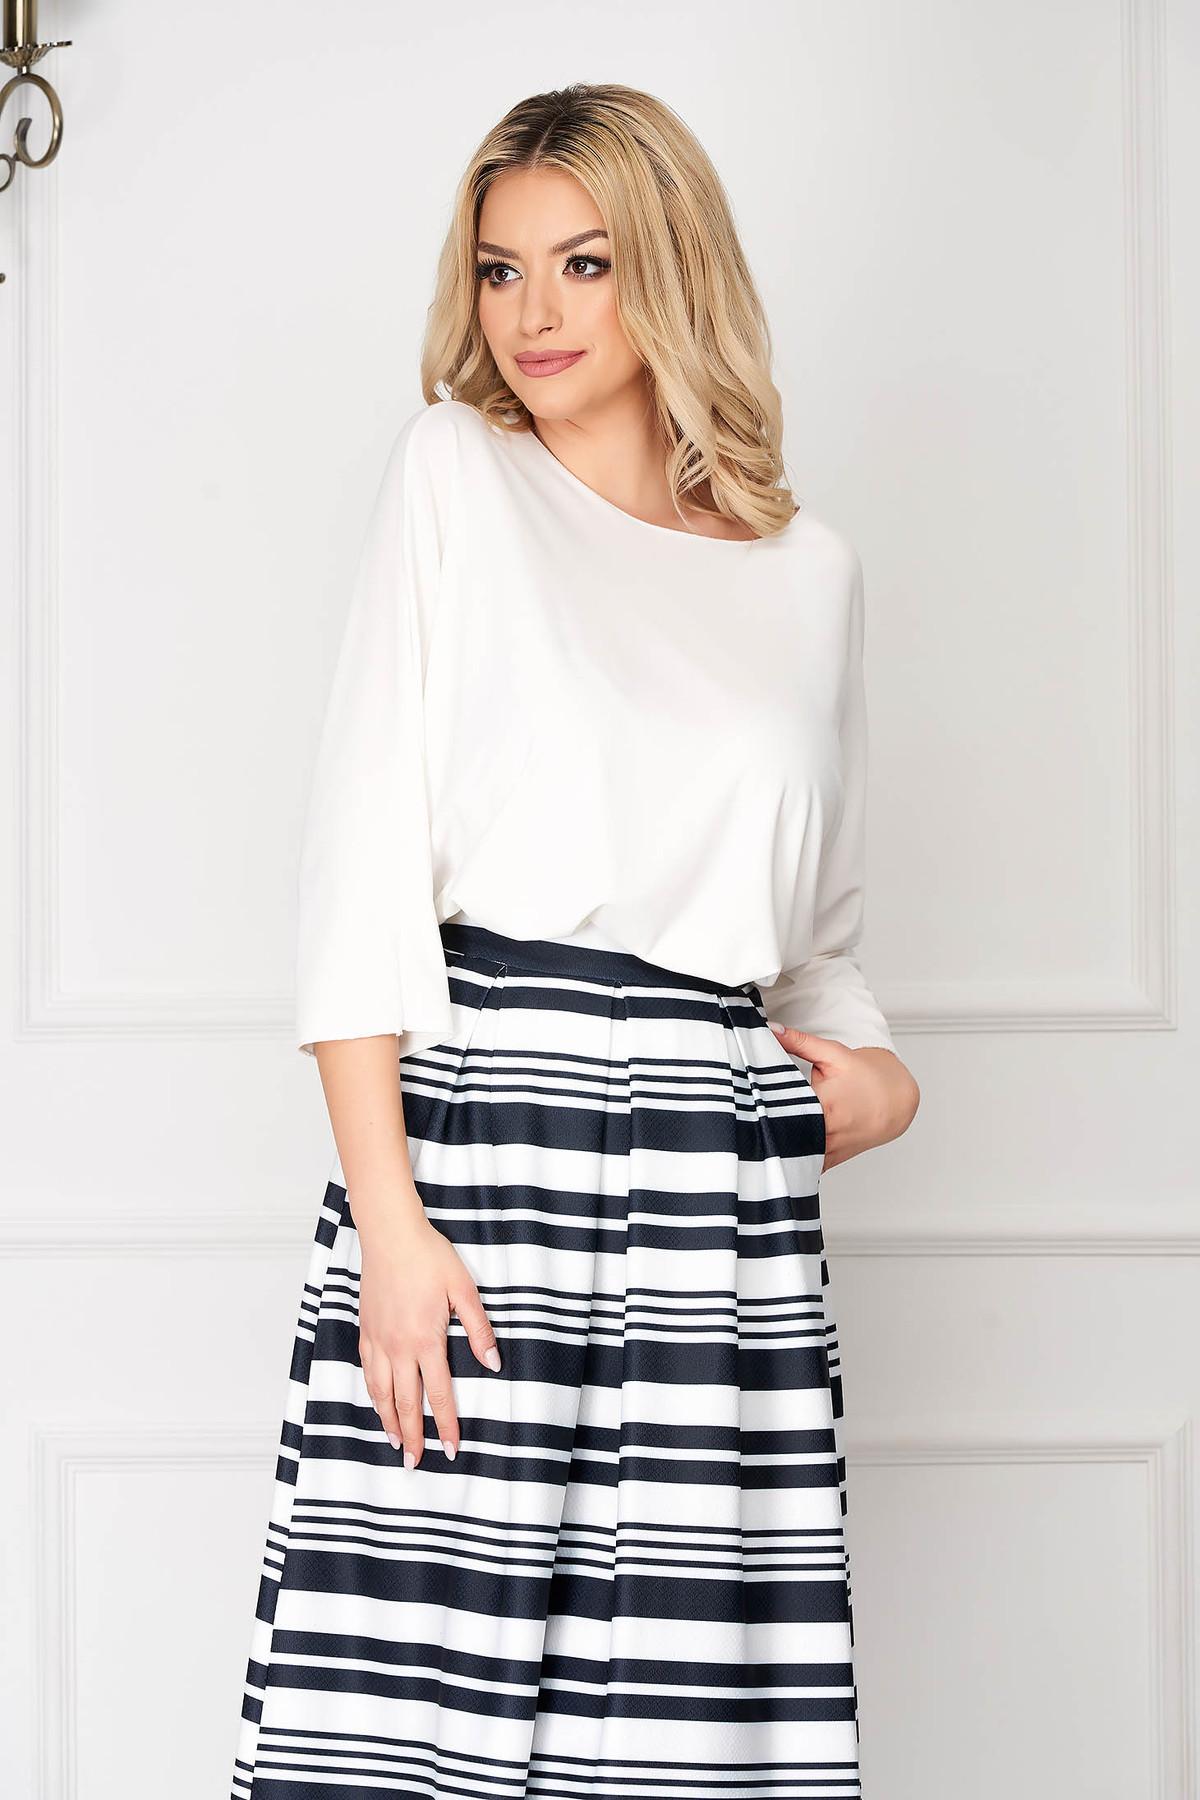 Bluza dama SunShine alba casual scurta asimetrica din bumbac cu croi larg